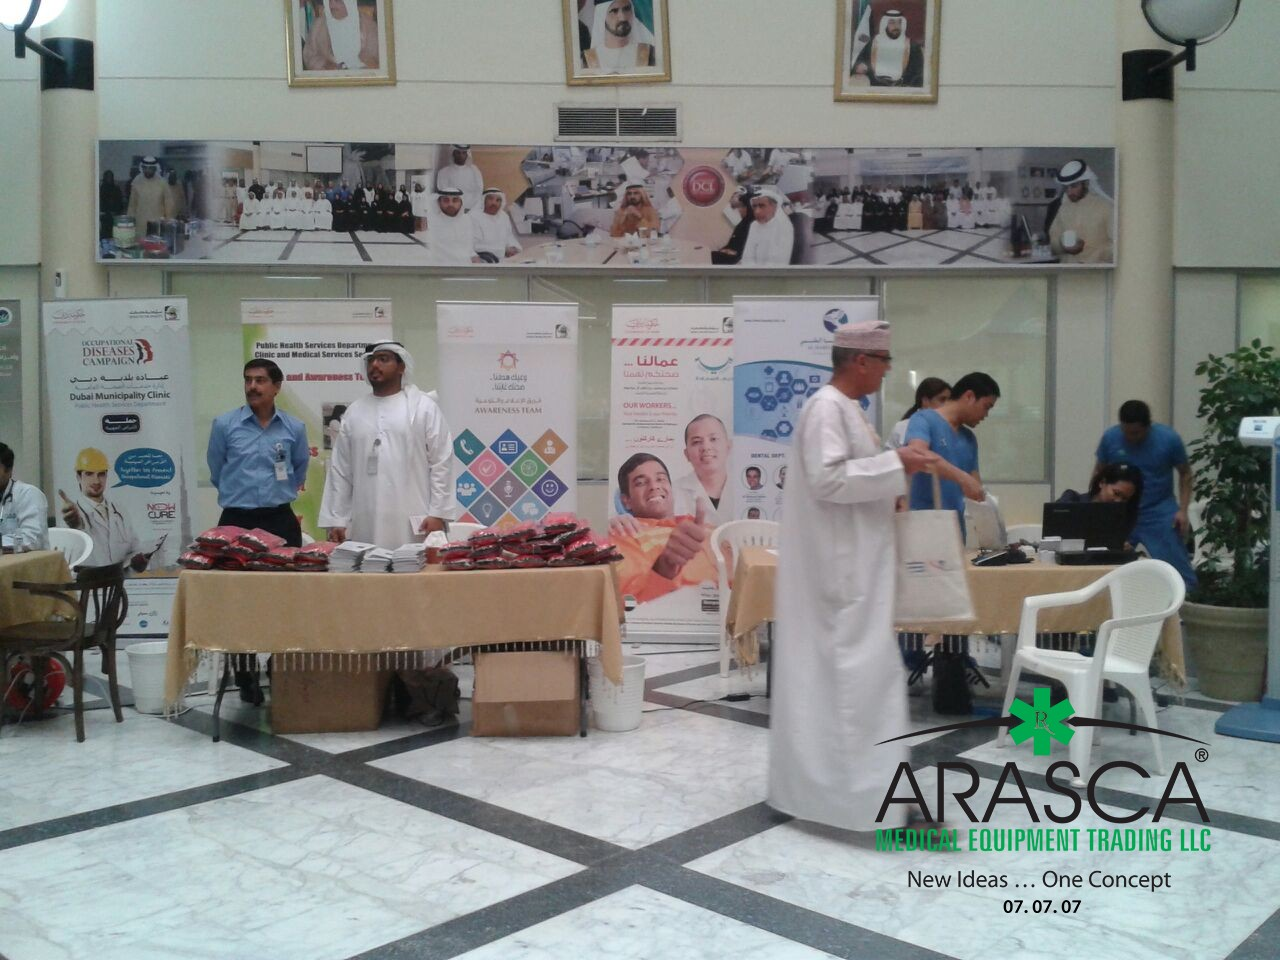 Dubai Municipality Event 2017 – ARASCA Medical Equipment Trading LLC